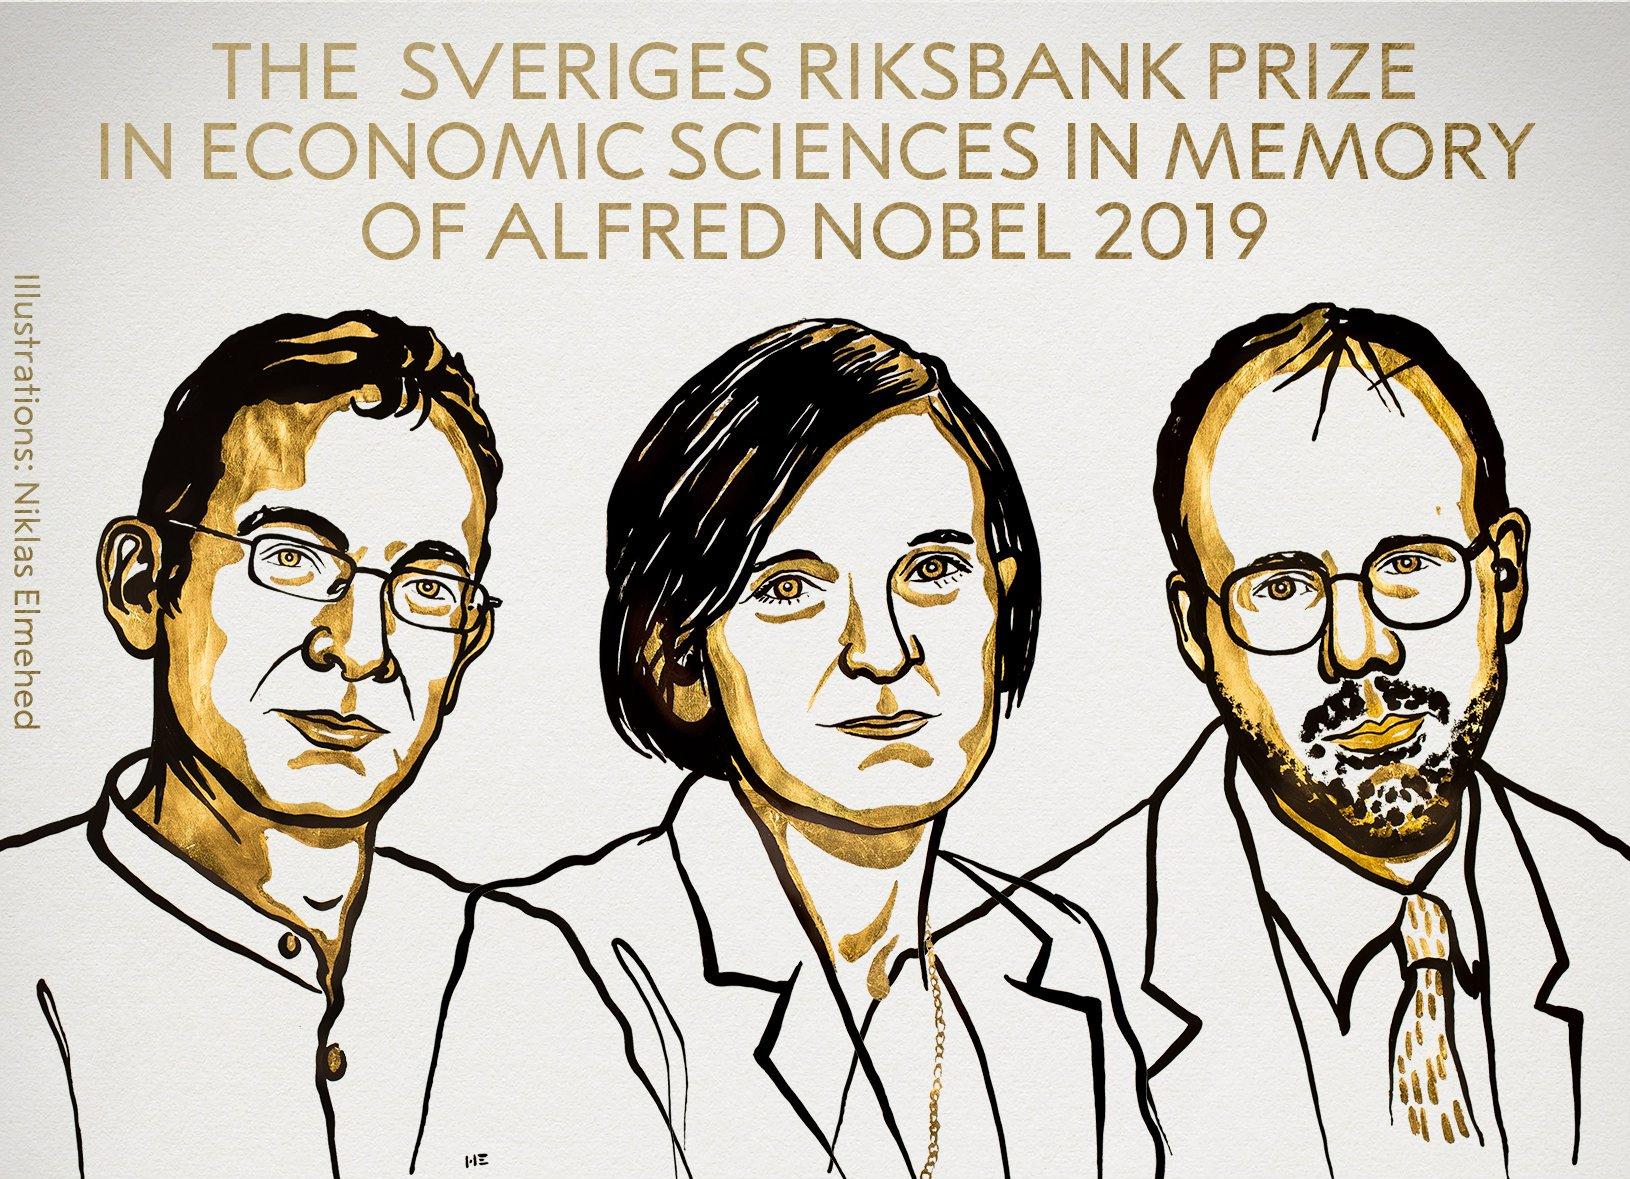 Il Nobel per l'Economia a Abhijit Banerjee, Esther Duflo e Michael Kremer